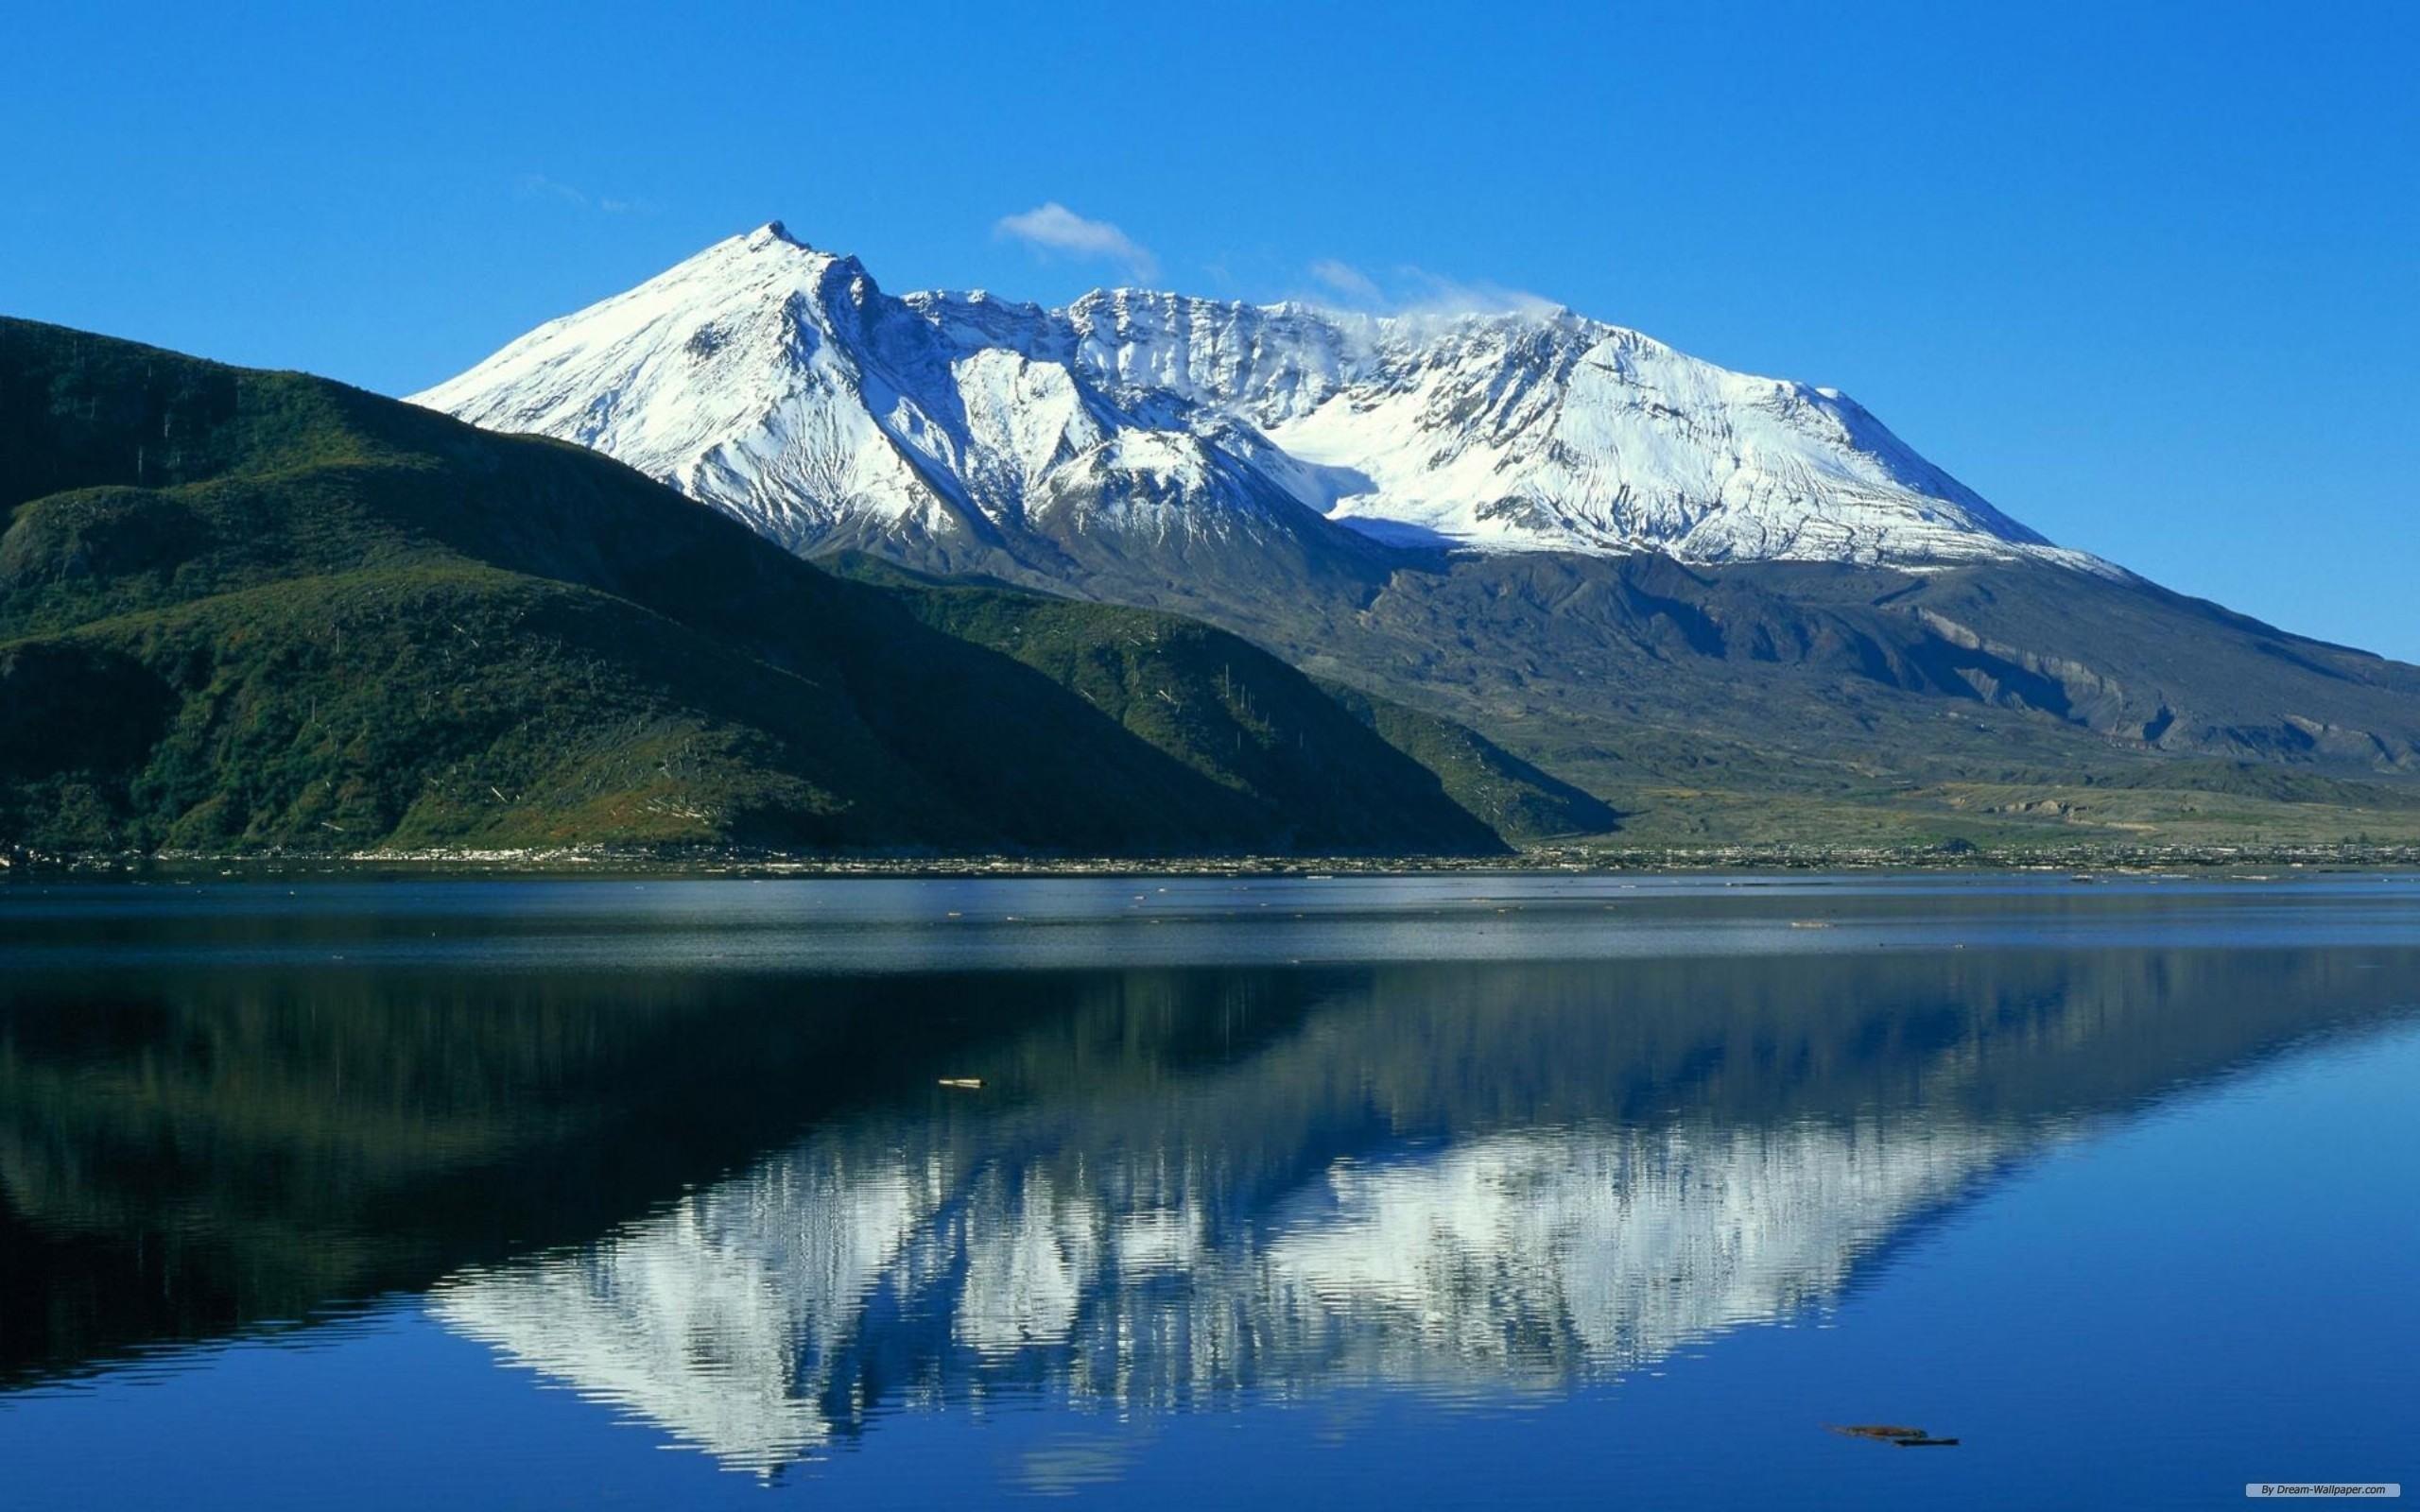 Mountain Beautiful Scenery Desktop Wallpaper – Zibrato